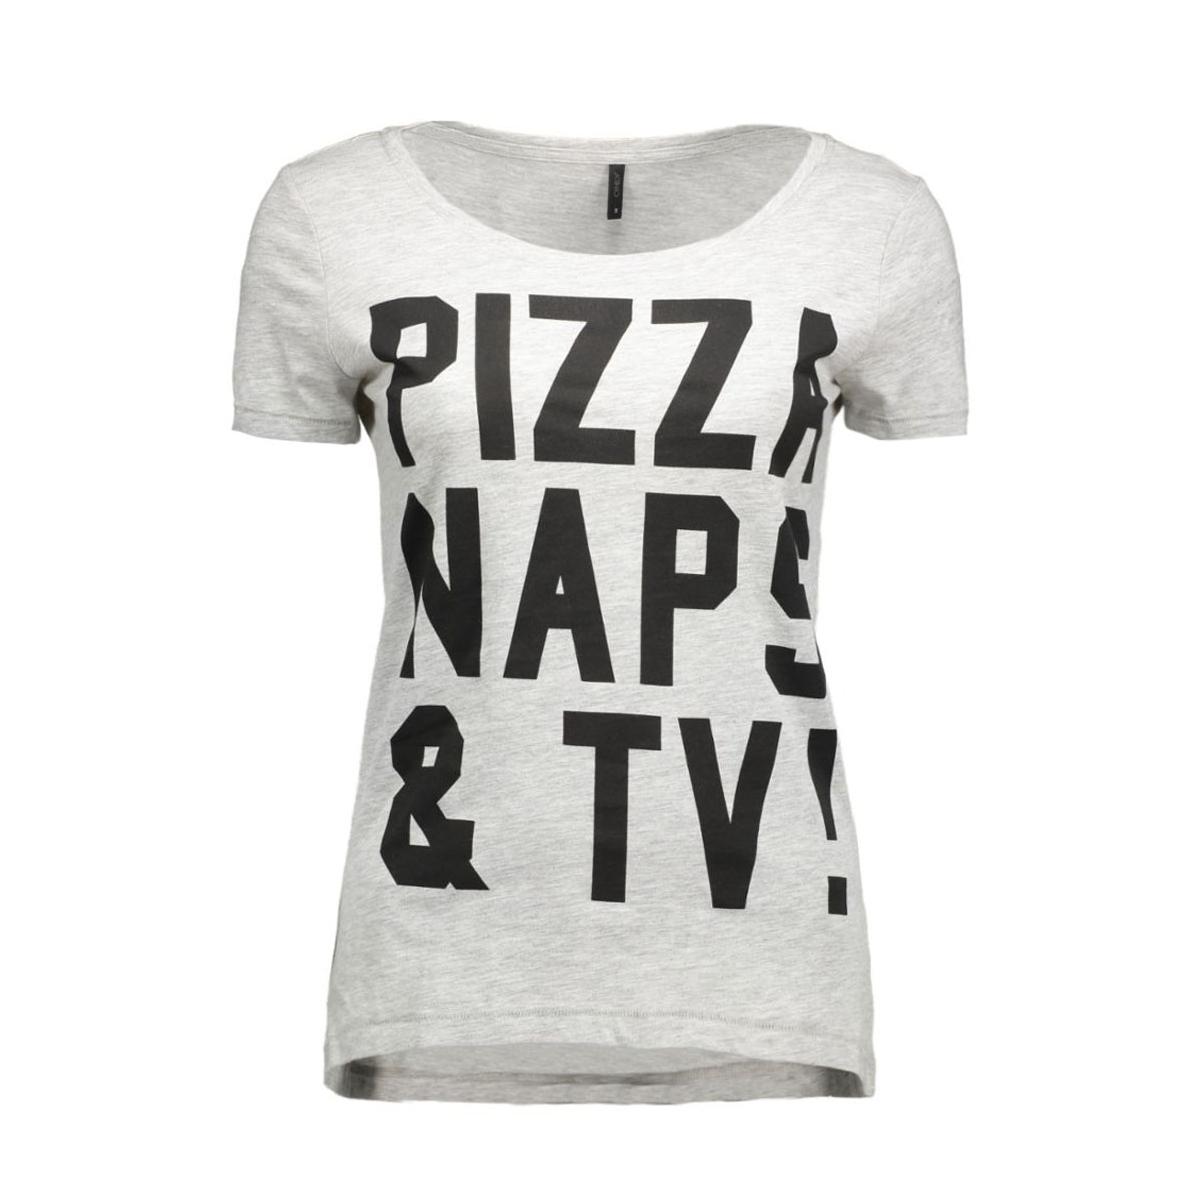 onlcotton s/s relax print top box e 15123689 only t-shirt light grey mela/naps